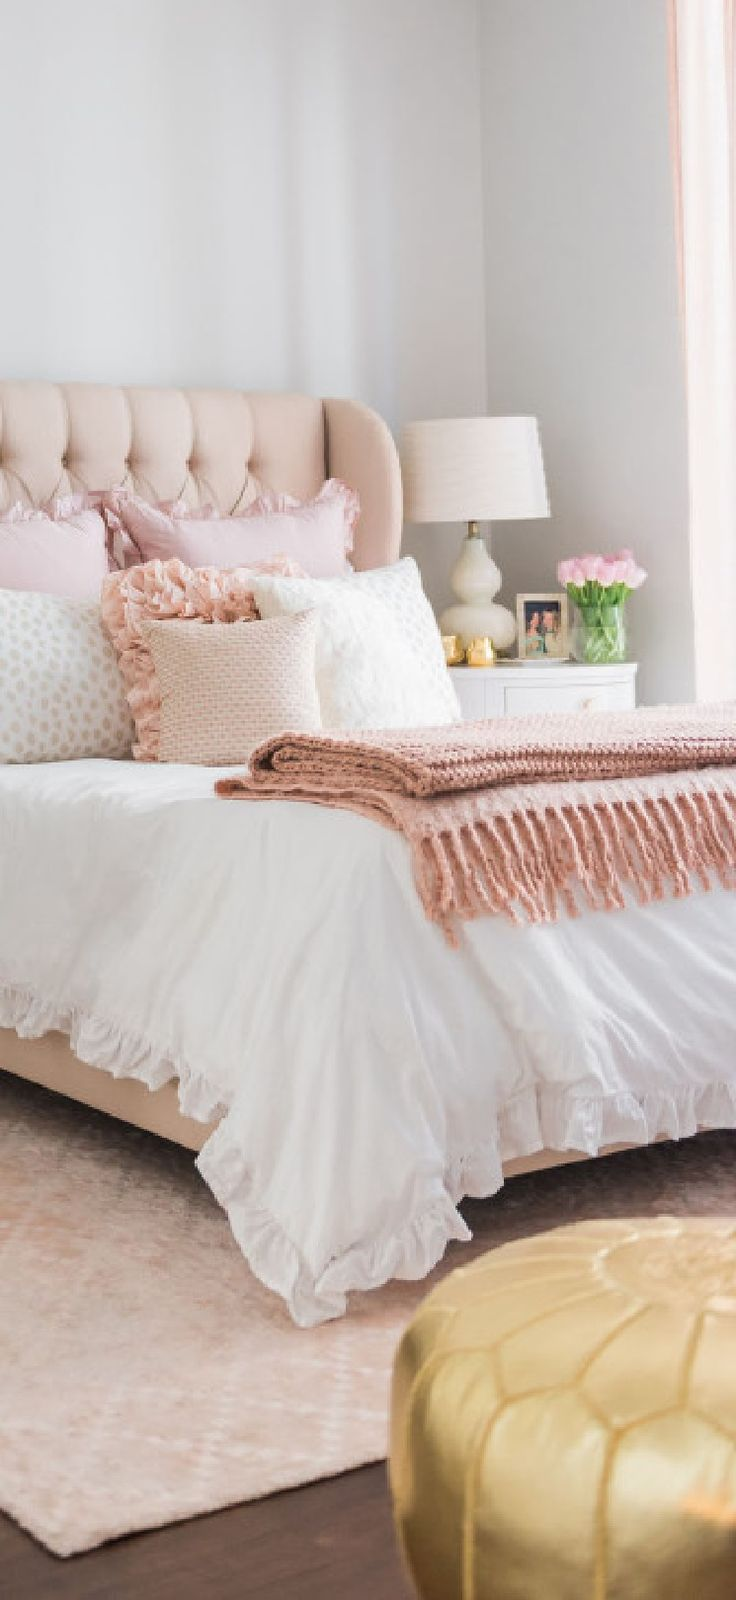 Marvelous Bed Linens, Bed Room, Guest Rooms, Bedroom Decor, Master Bedroom, Simple  Things, Sweet Dreams, Bachelorette, Boudoir